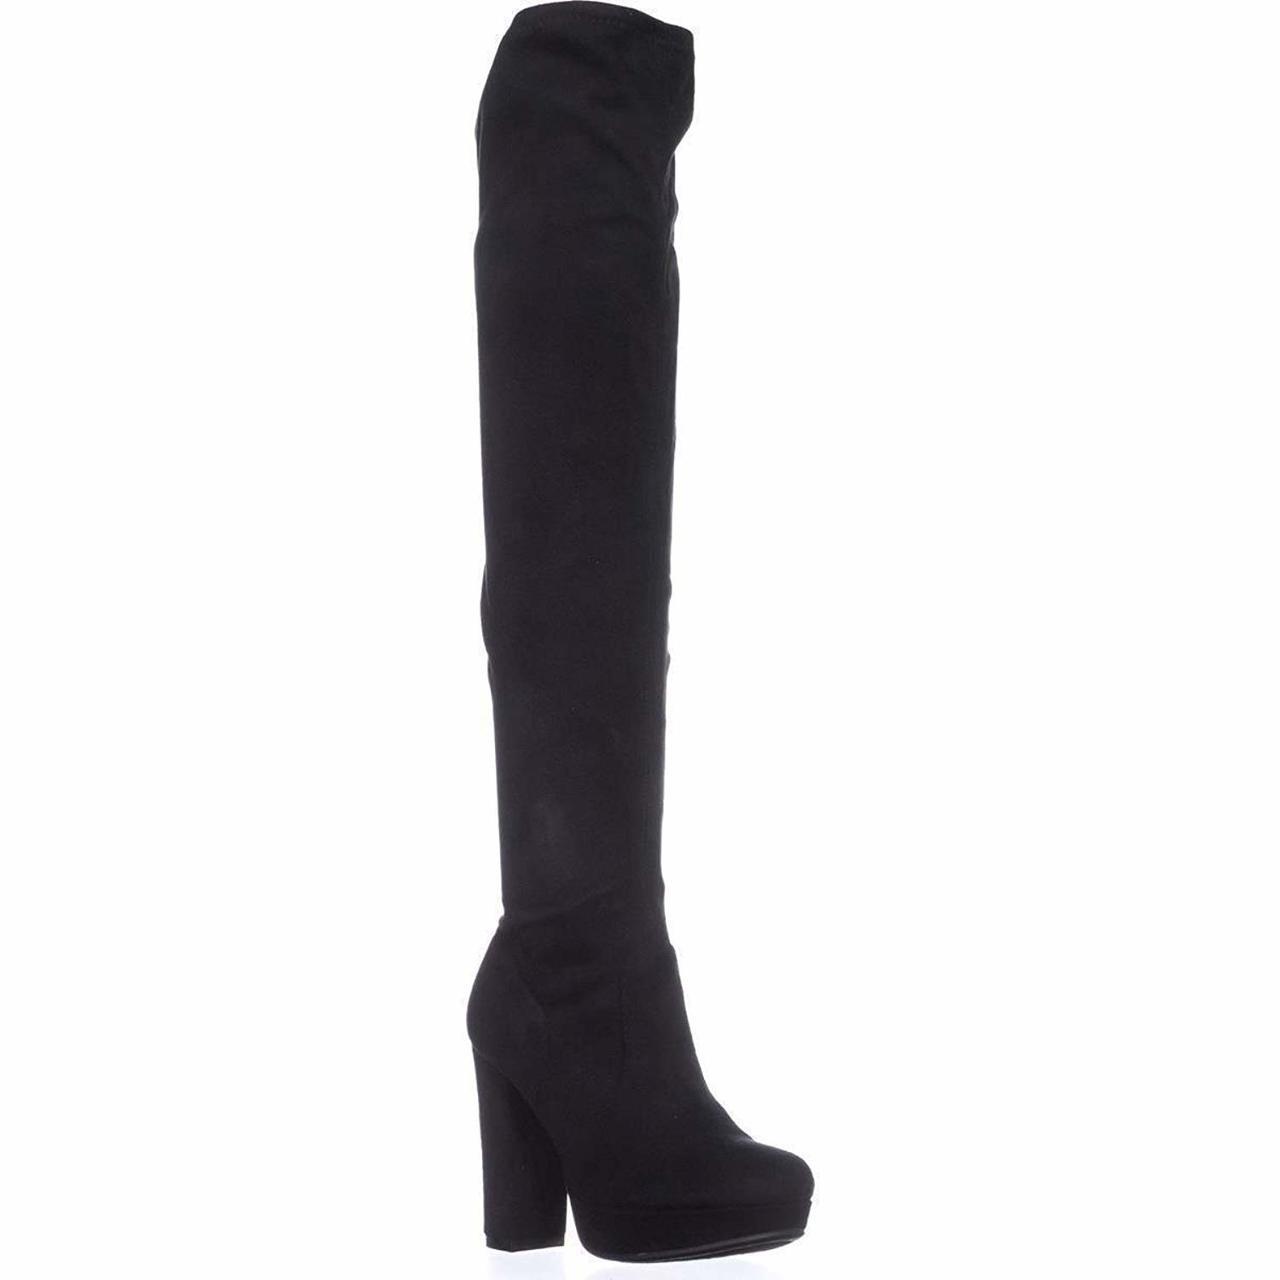 c78c58ce13127 Bar III Womens Night Closed Toe Over Knee Fashion Boots~pp-19125819